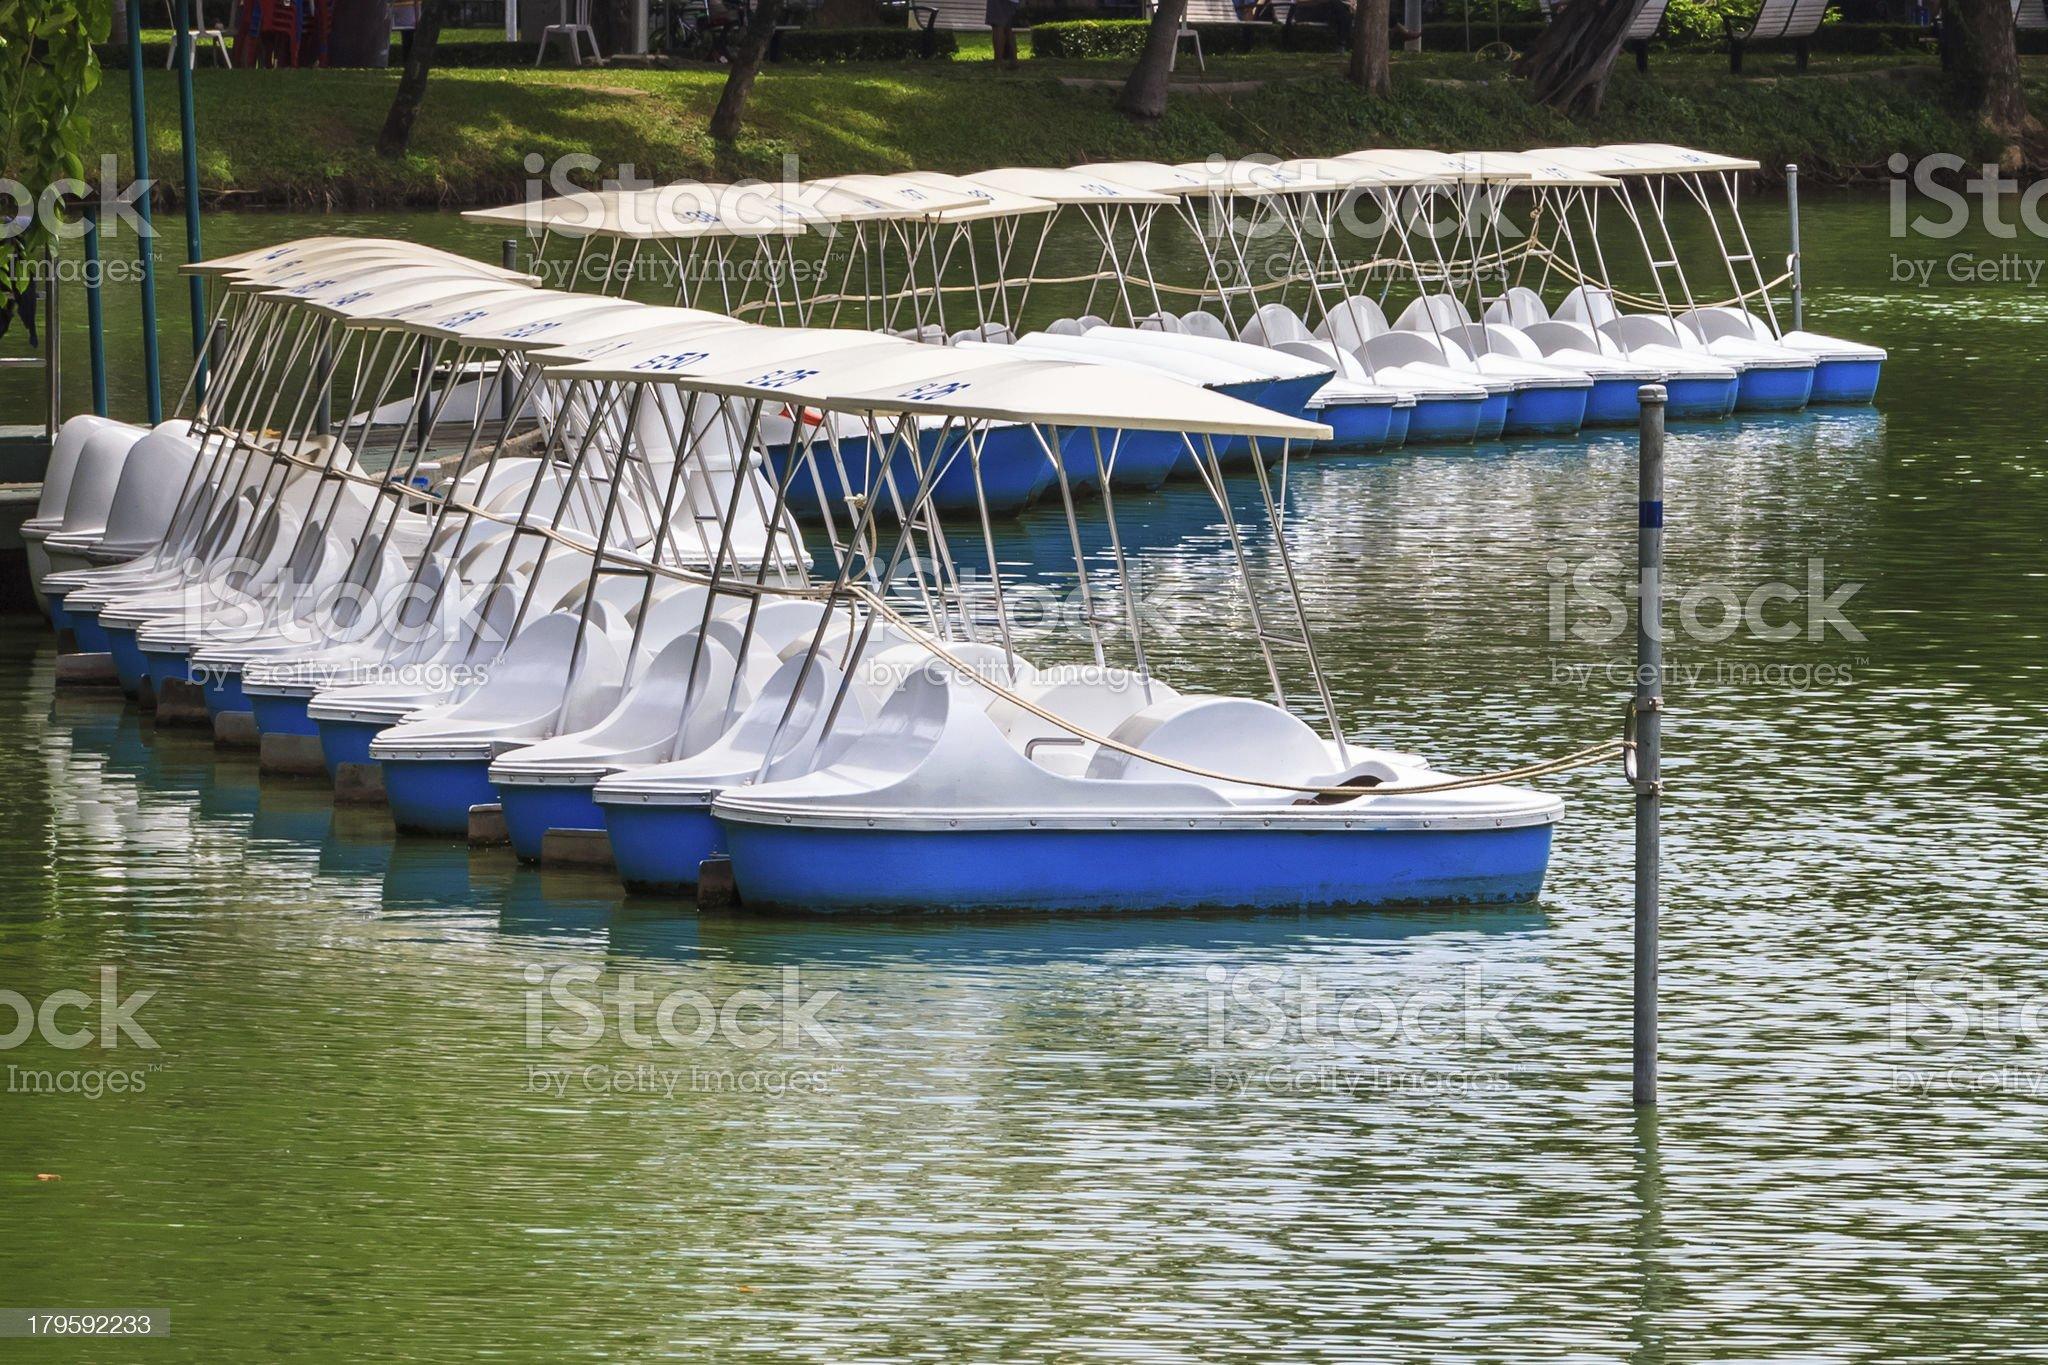 Pedal Boats locked at Peaceful Lake Marina, Recreation Equipment royalty-free stock photo